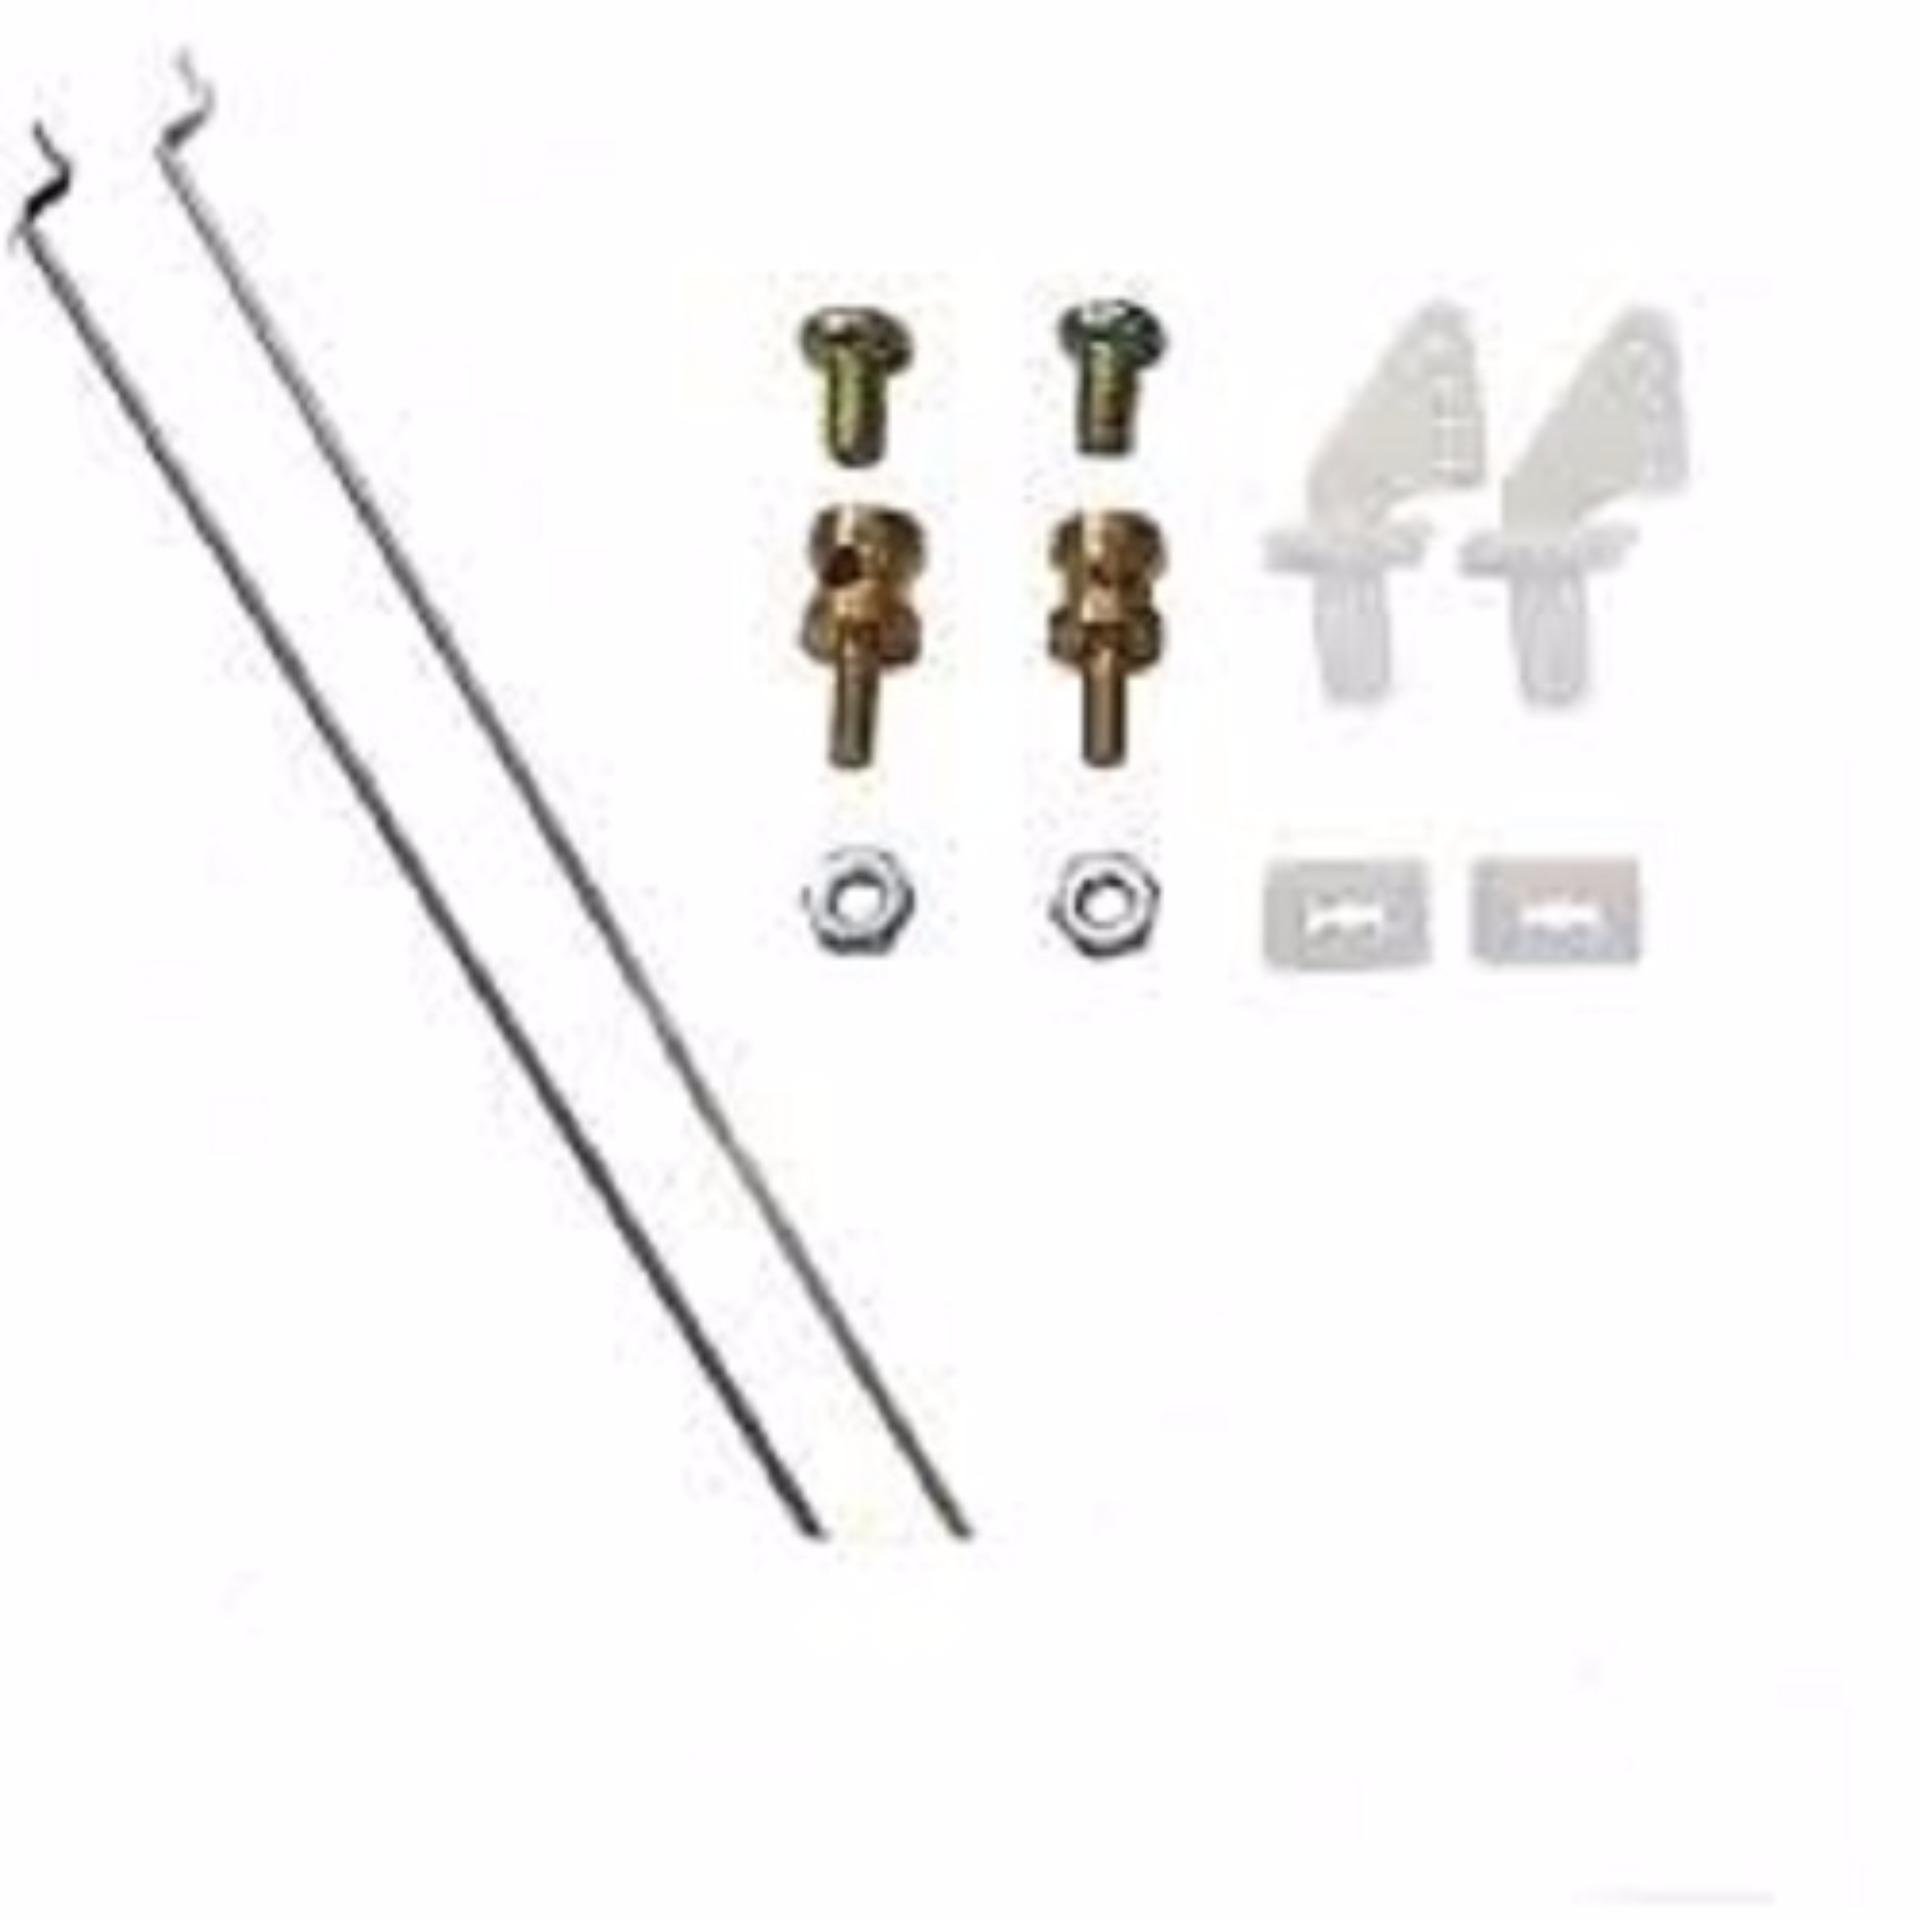 Bộ 3 thép link, ốc link, horn